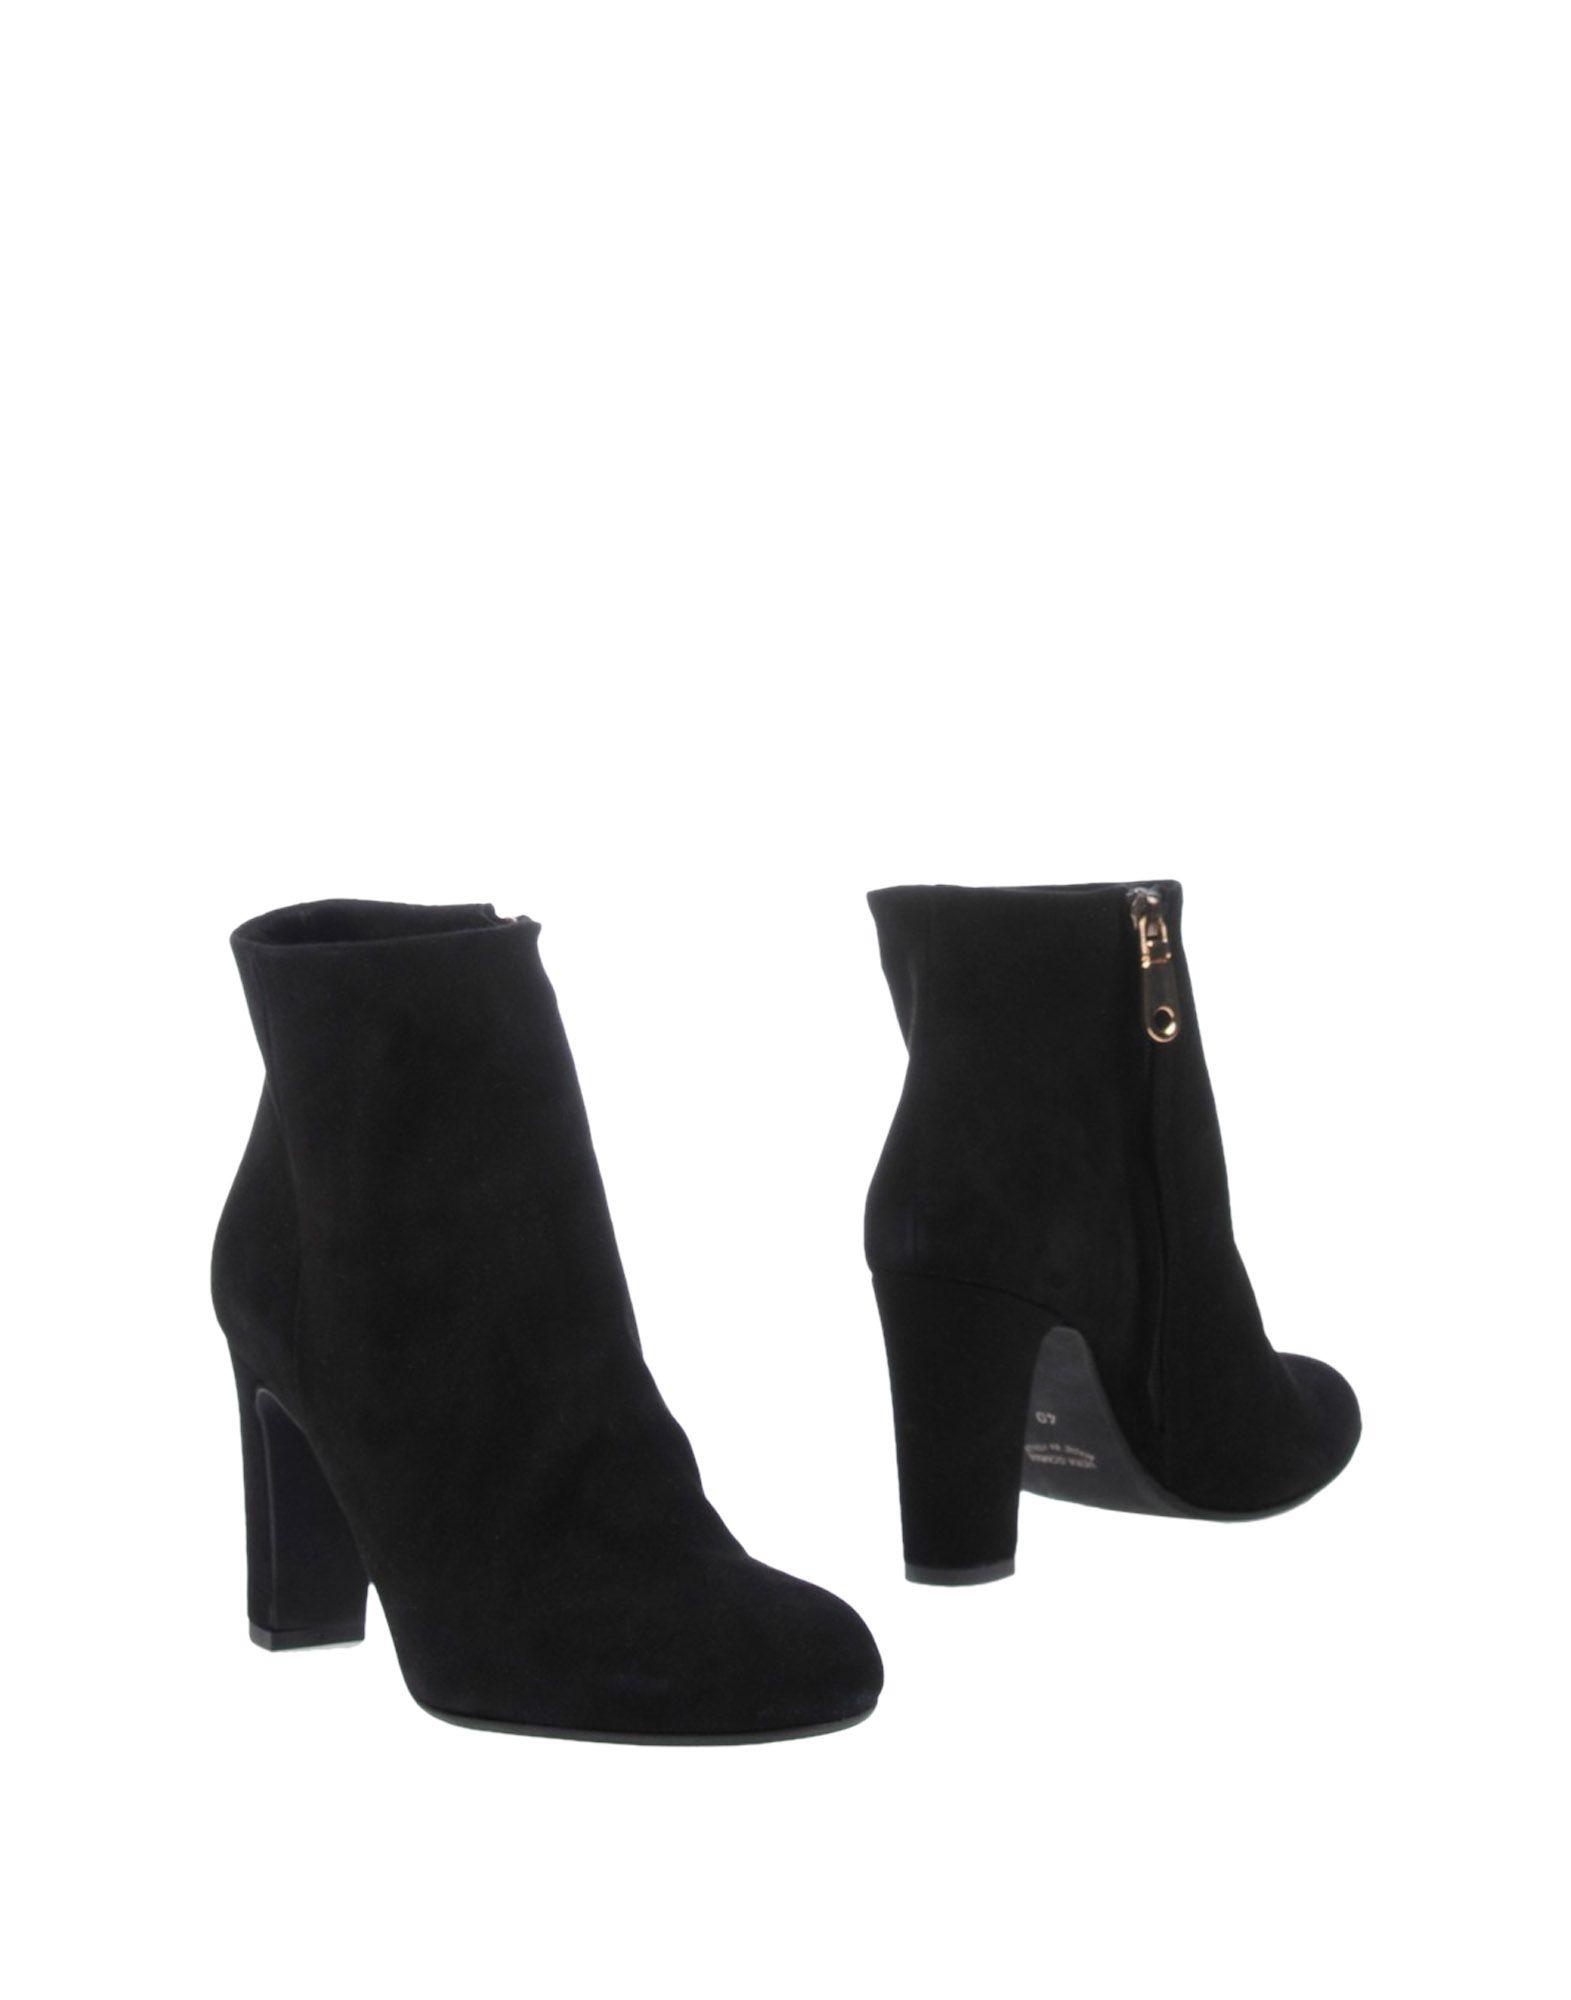 Vicini Tapeet Stiefelette Damen 11420380RB  11420380RB Damen Gute Qualität beliebte Schuhe 39b139